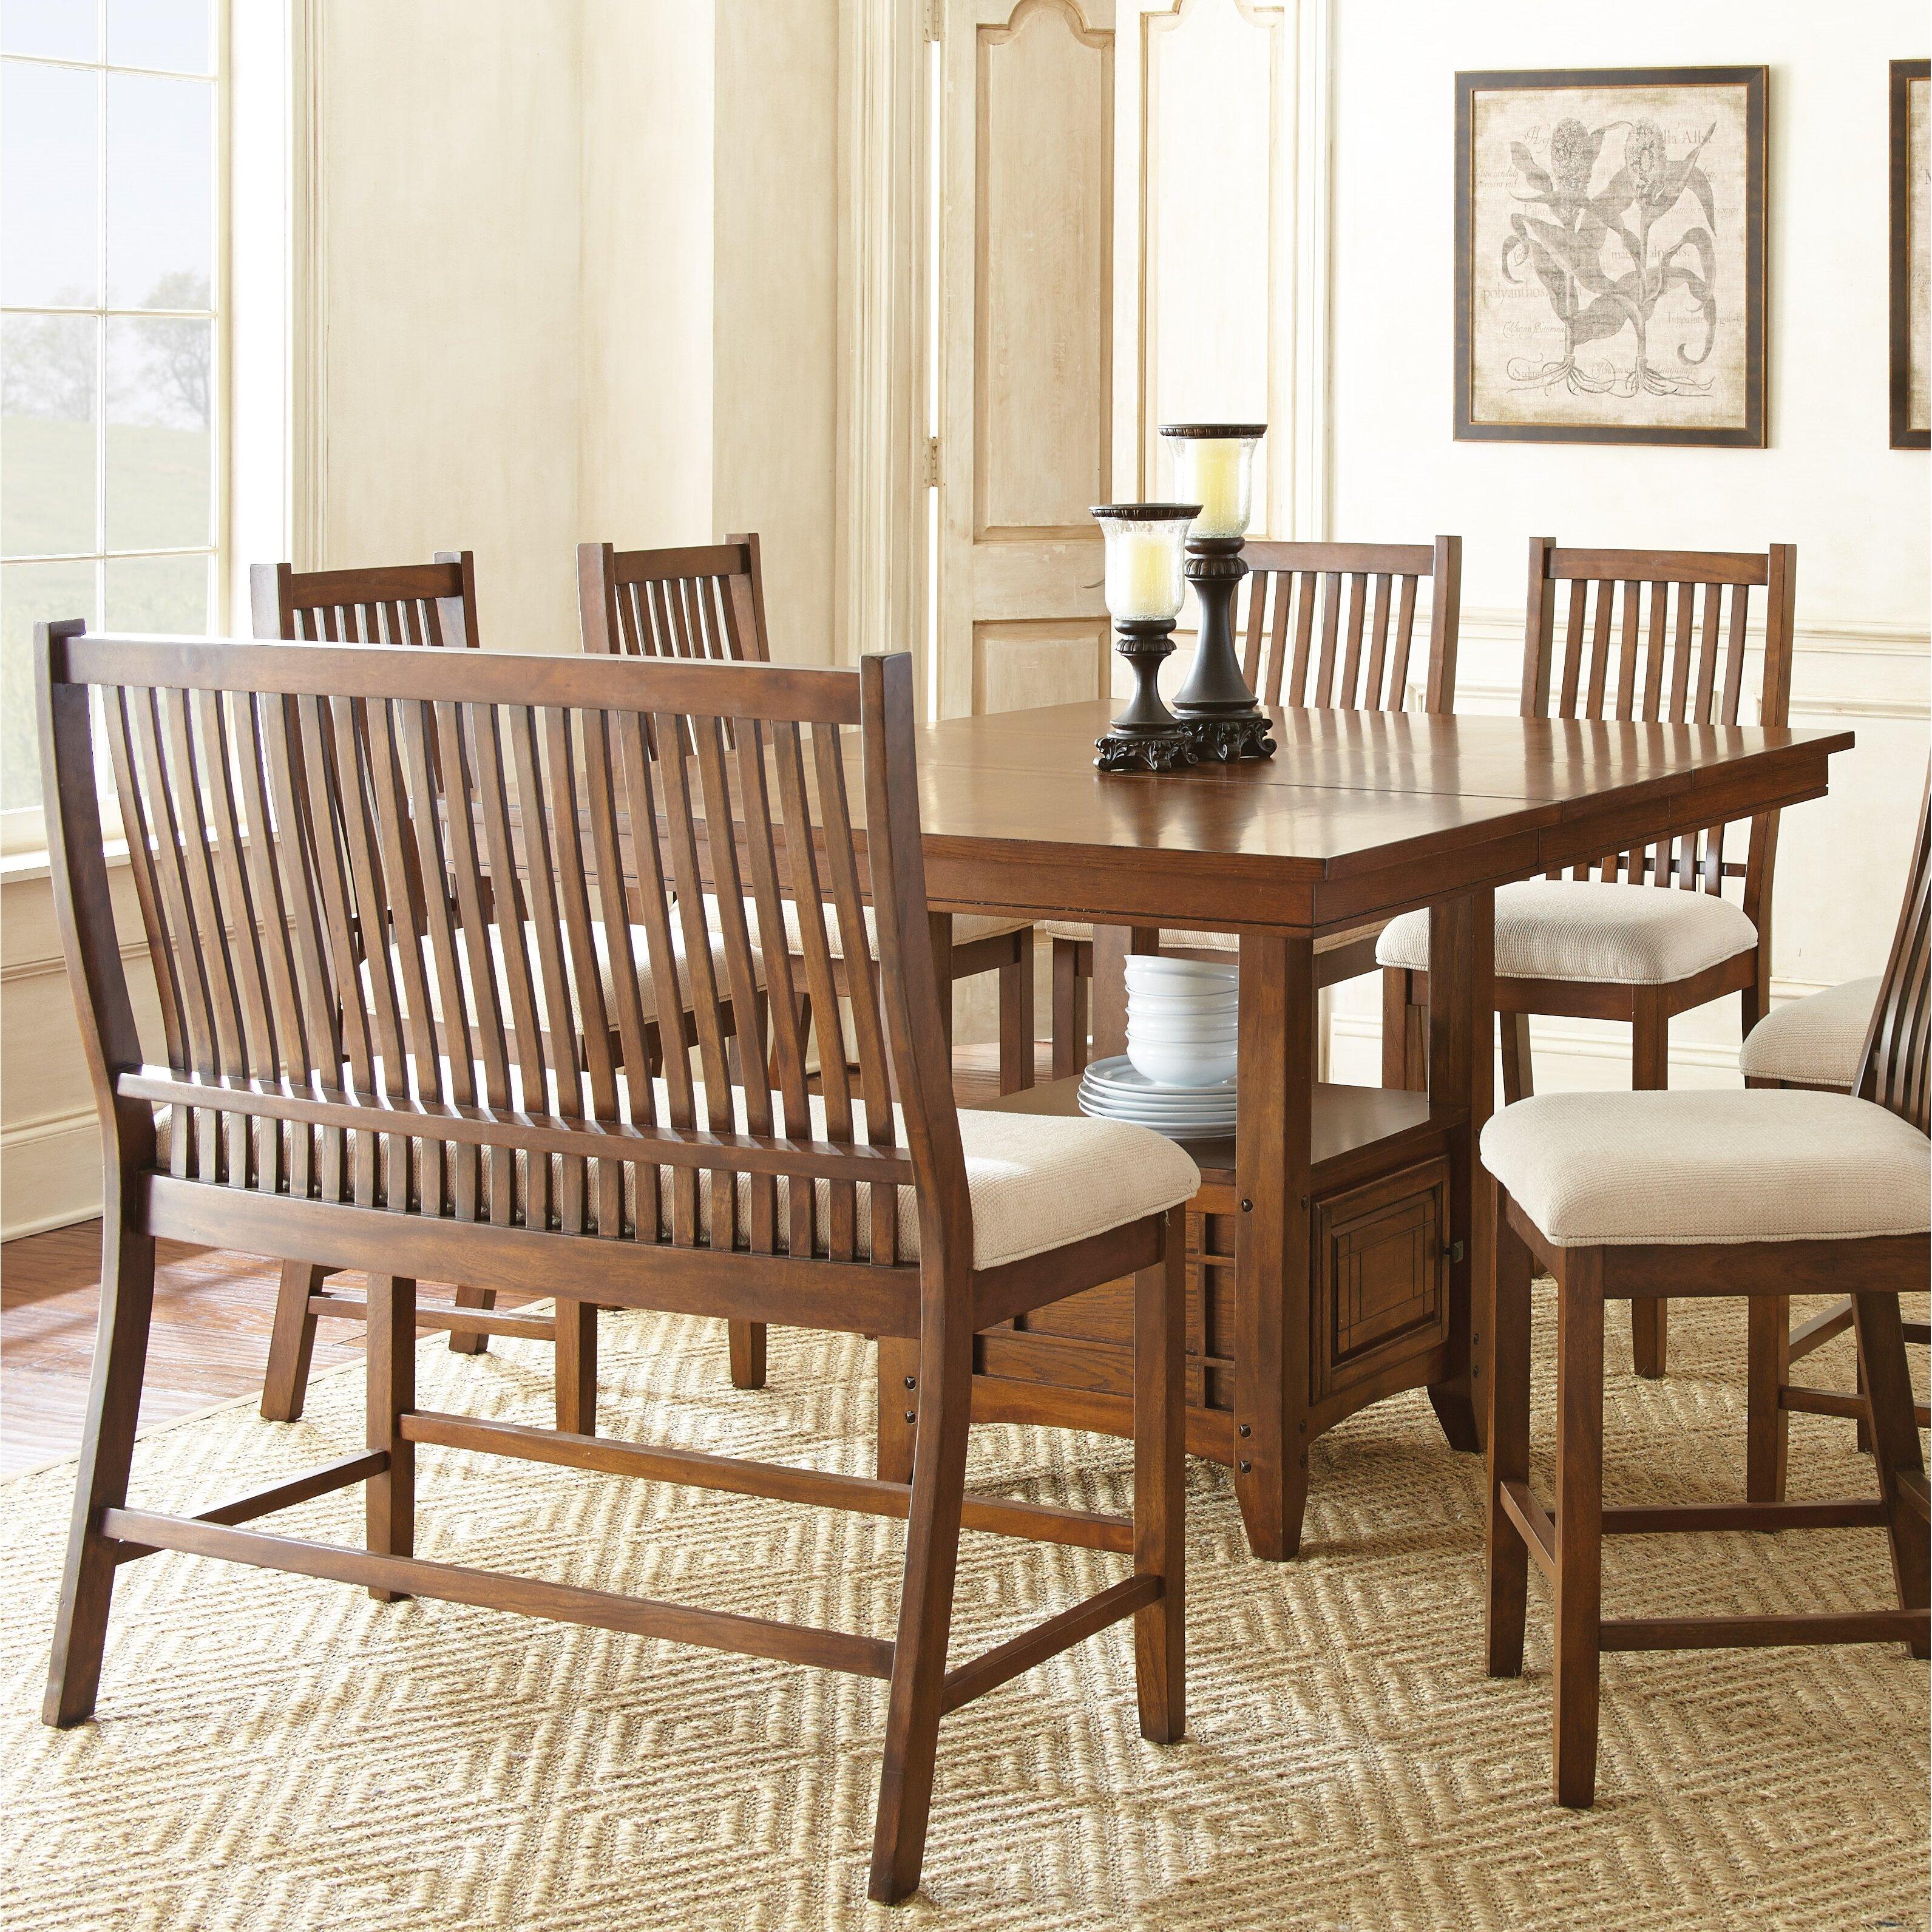 alcott hill kayan 8 piece dining set reviews wayfair. Black Bedroom Furniture Sets. Home Design Ideas